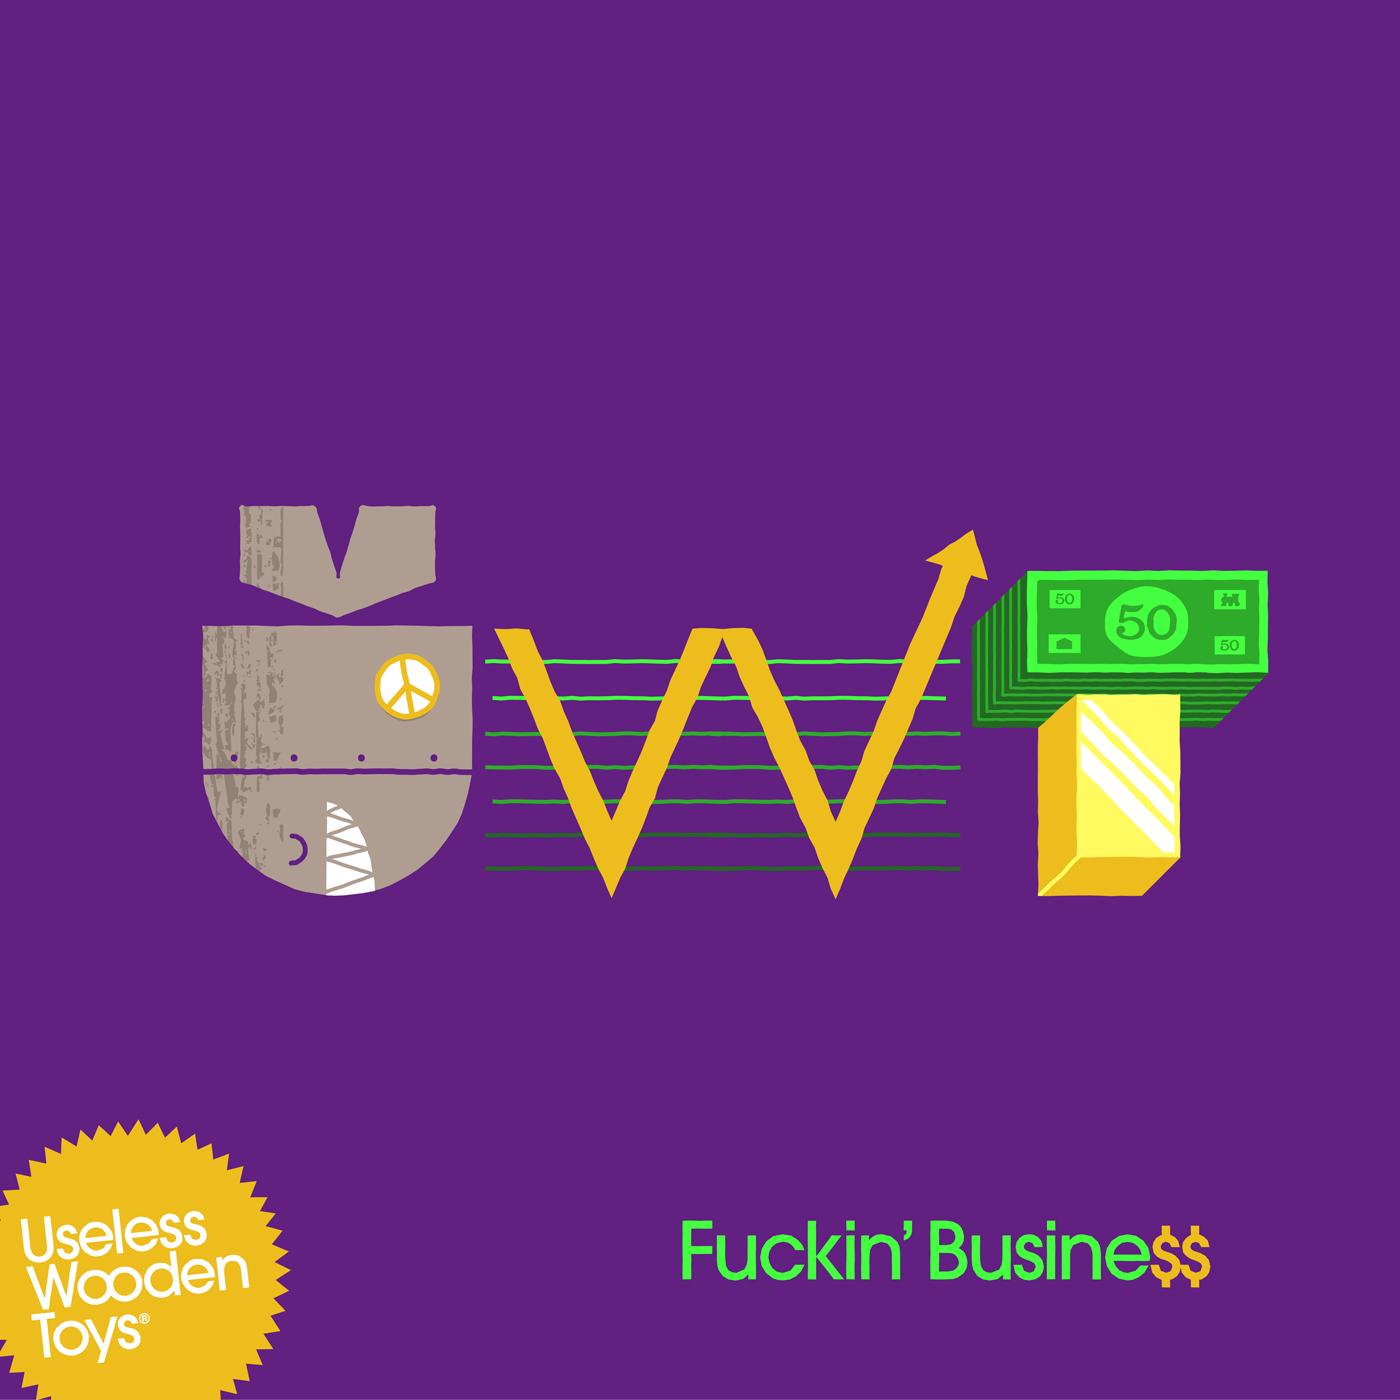 DV007 / Useless Wooden Toys - Fuckin' Busine$$